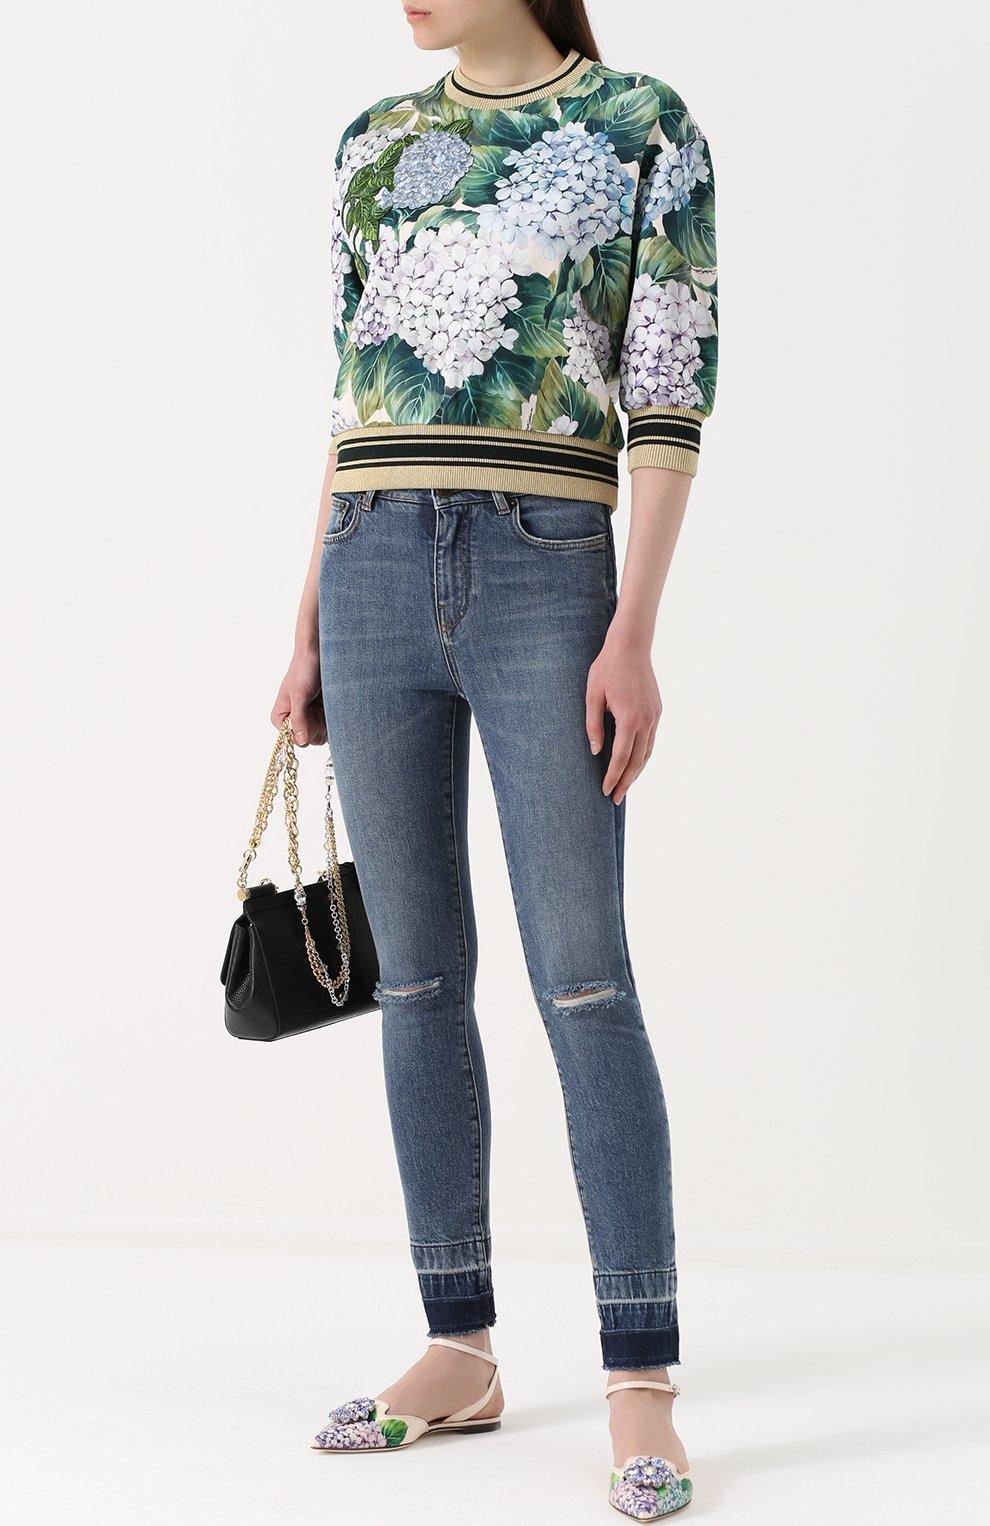 Джинсы-скинни с потертостями Dolce & Gabbana синие   Фото №2